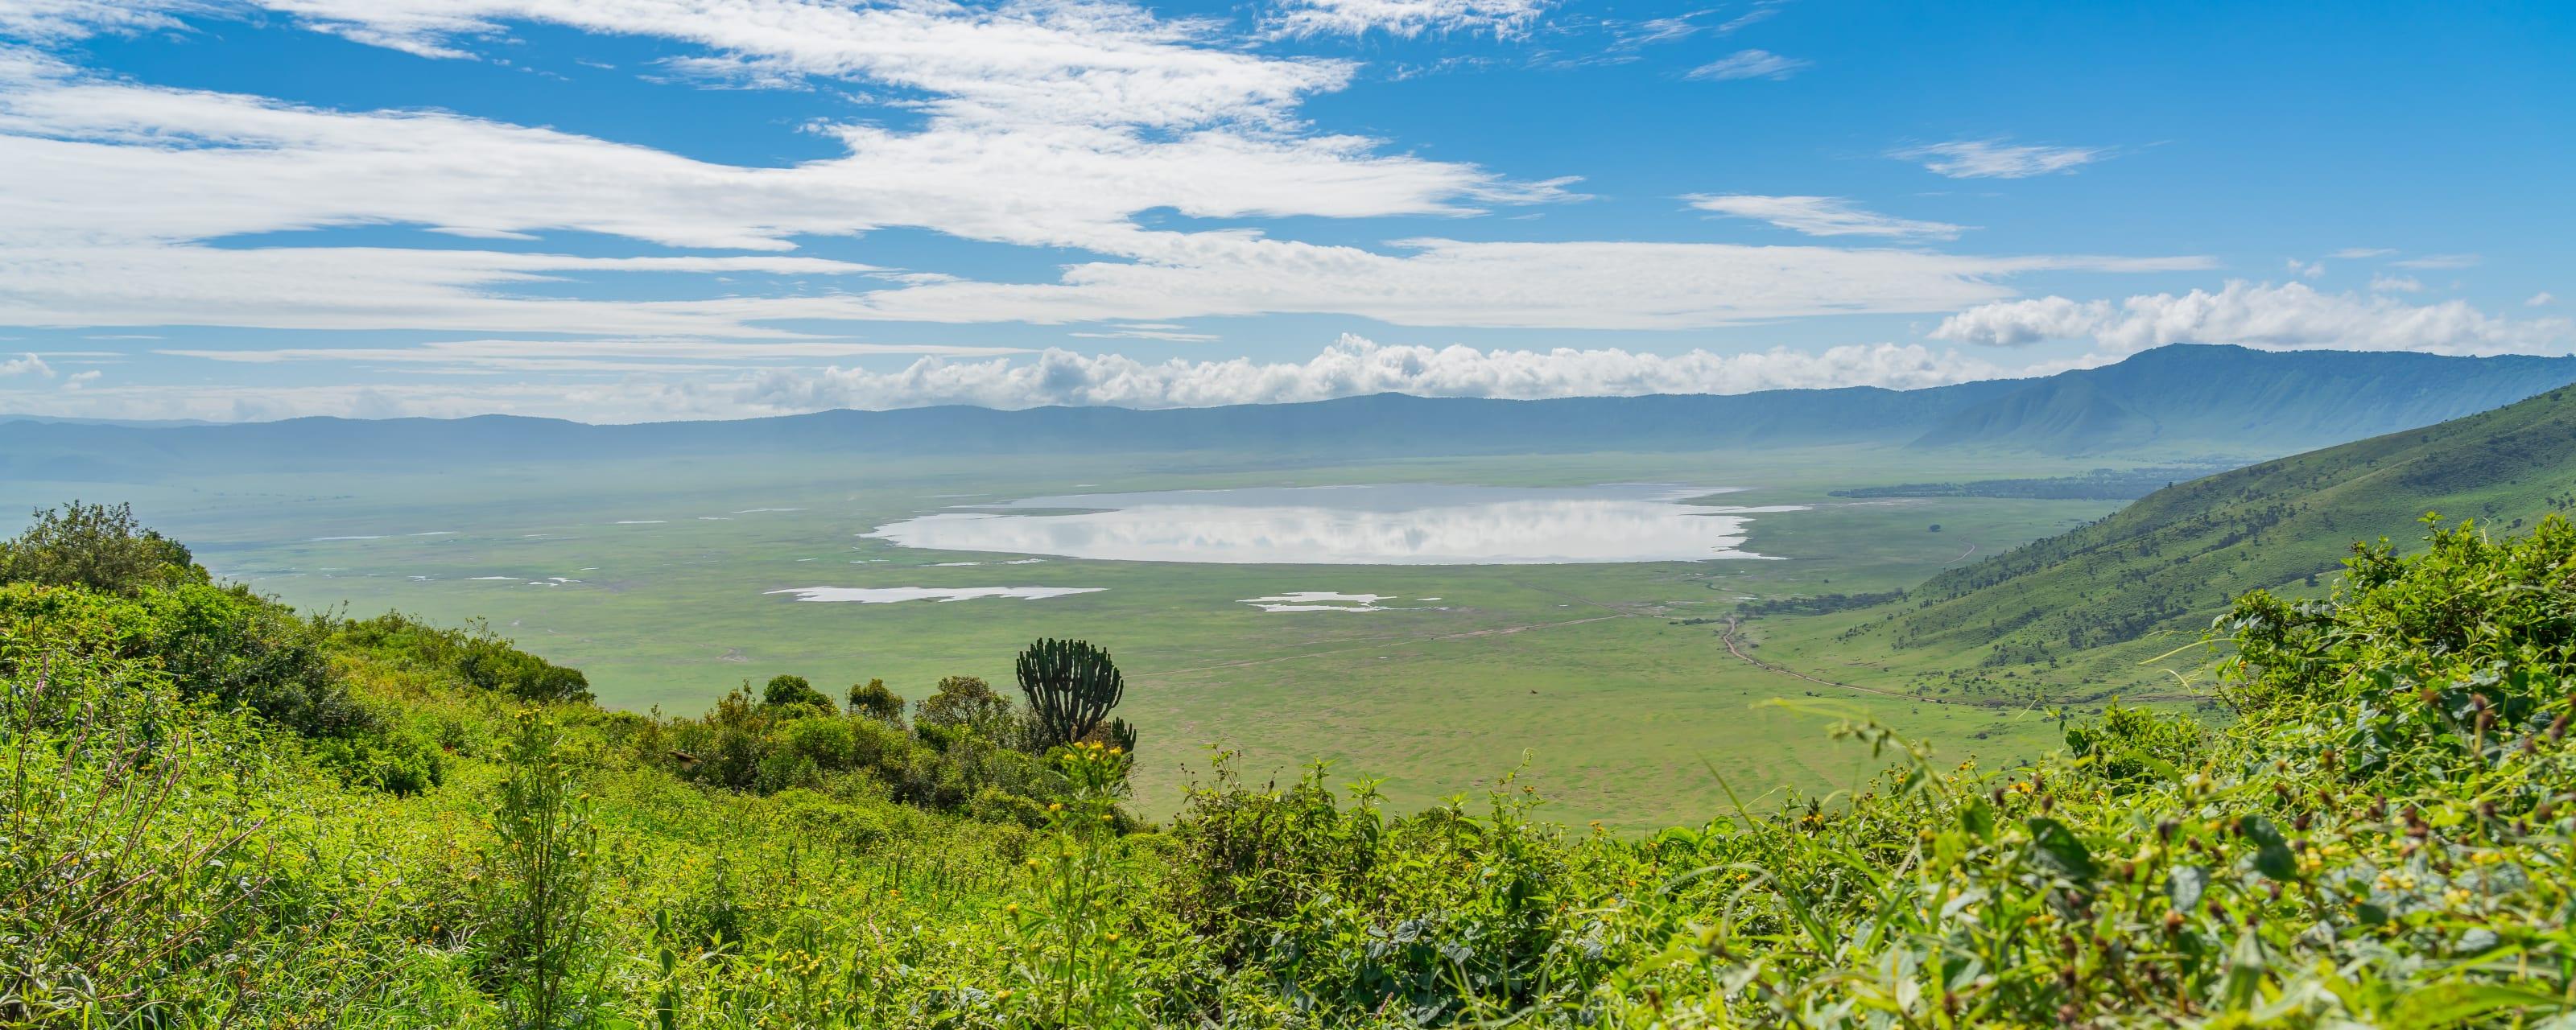 Ngorongoro - Ngorongoro Crater